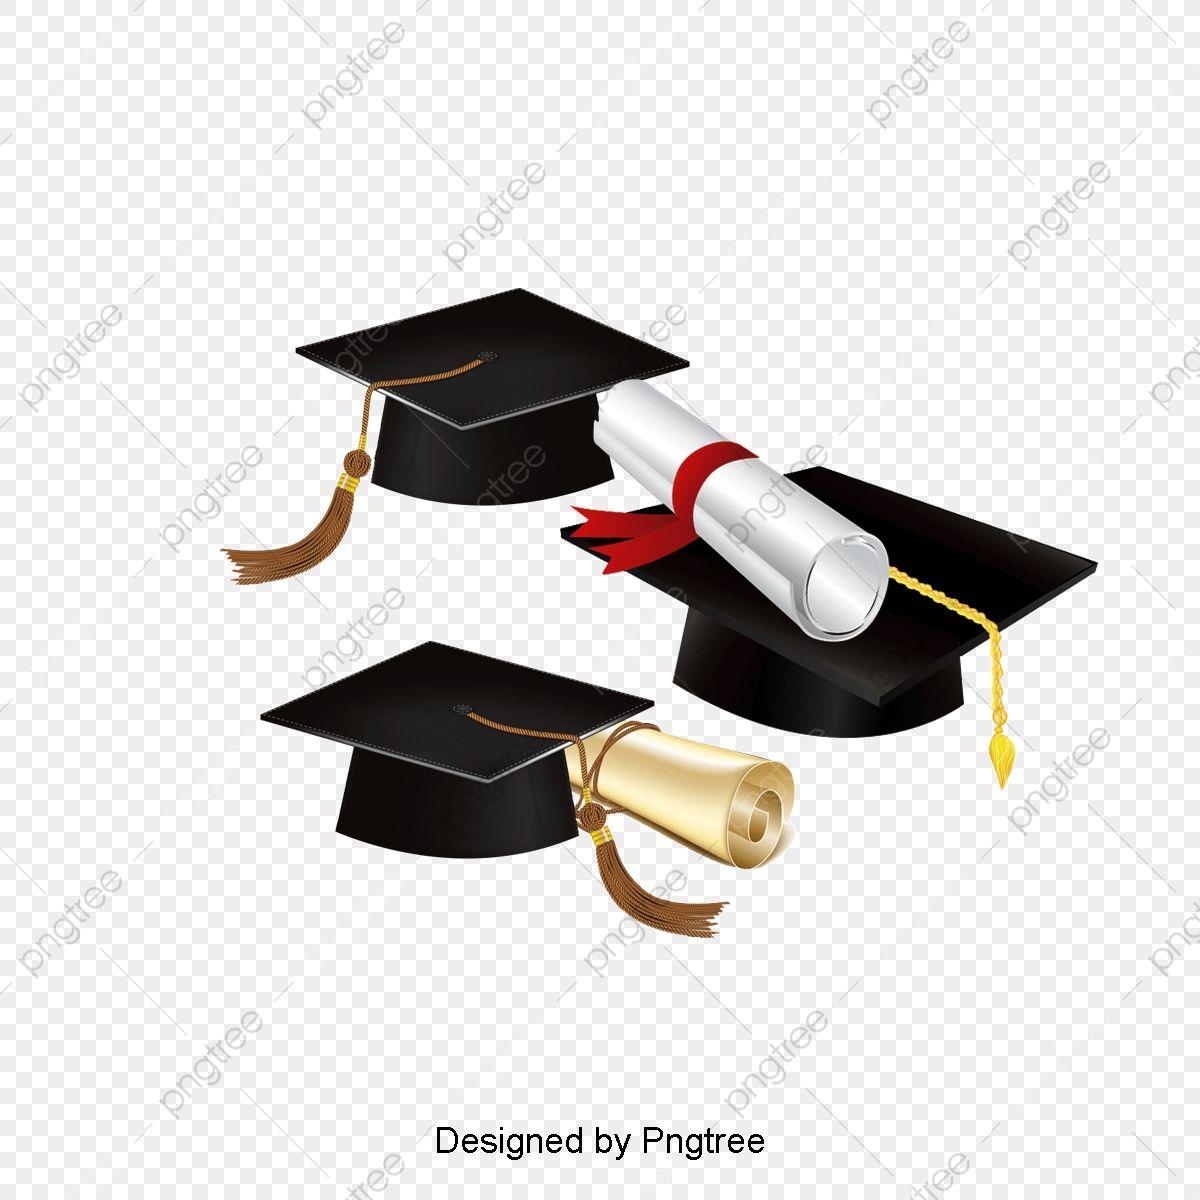 Graduation Cap Material Graduation Hat Clipart Cartoon Hand Drawing Graduation Cap Png Transparent Clipart Image And Psd File For Free Download Cap Png How To Draw Hands Cartoon Hand